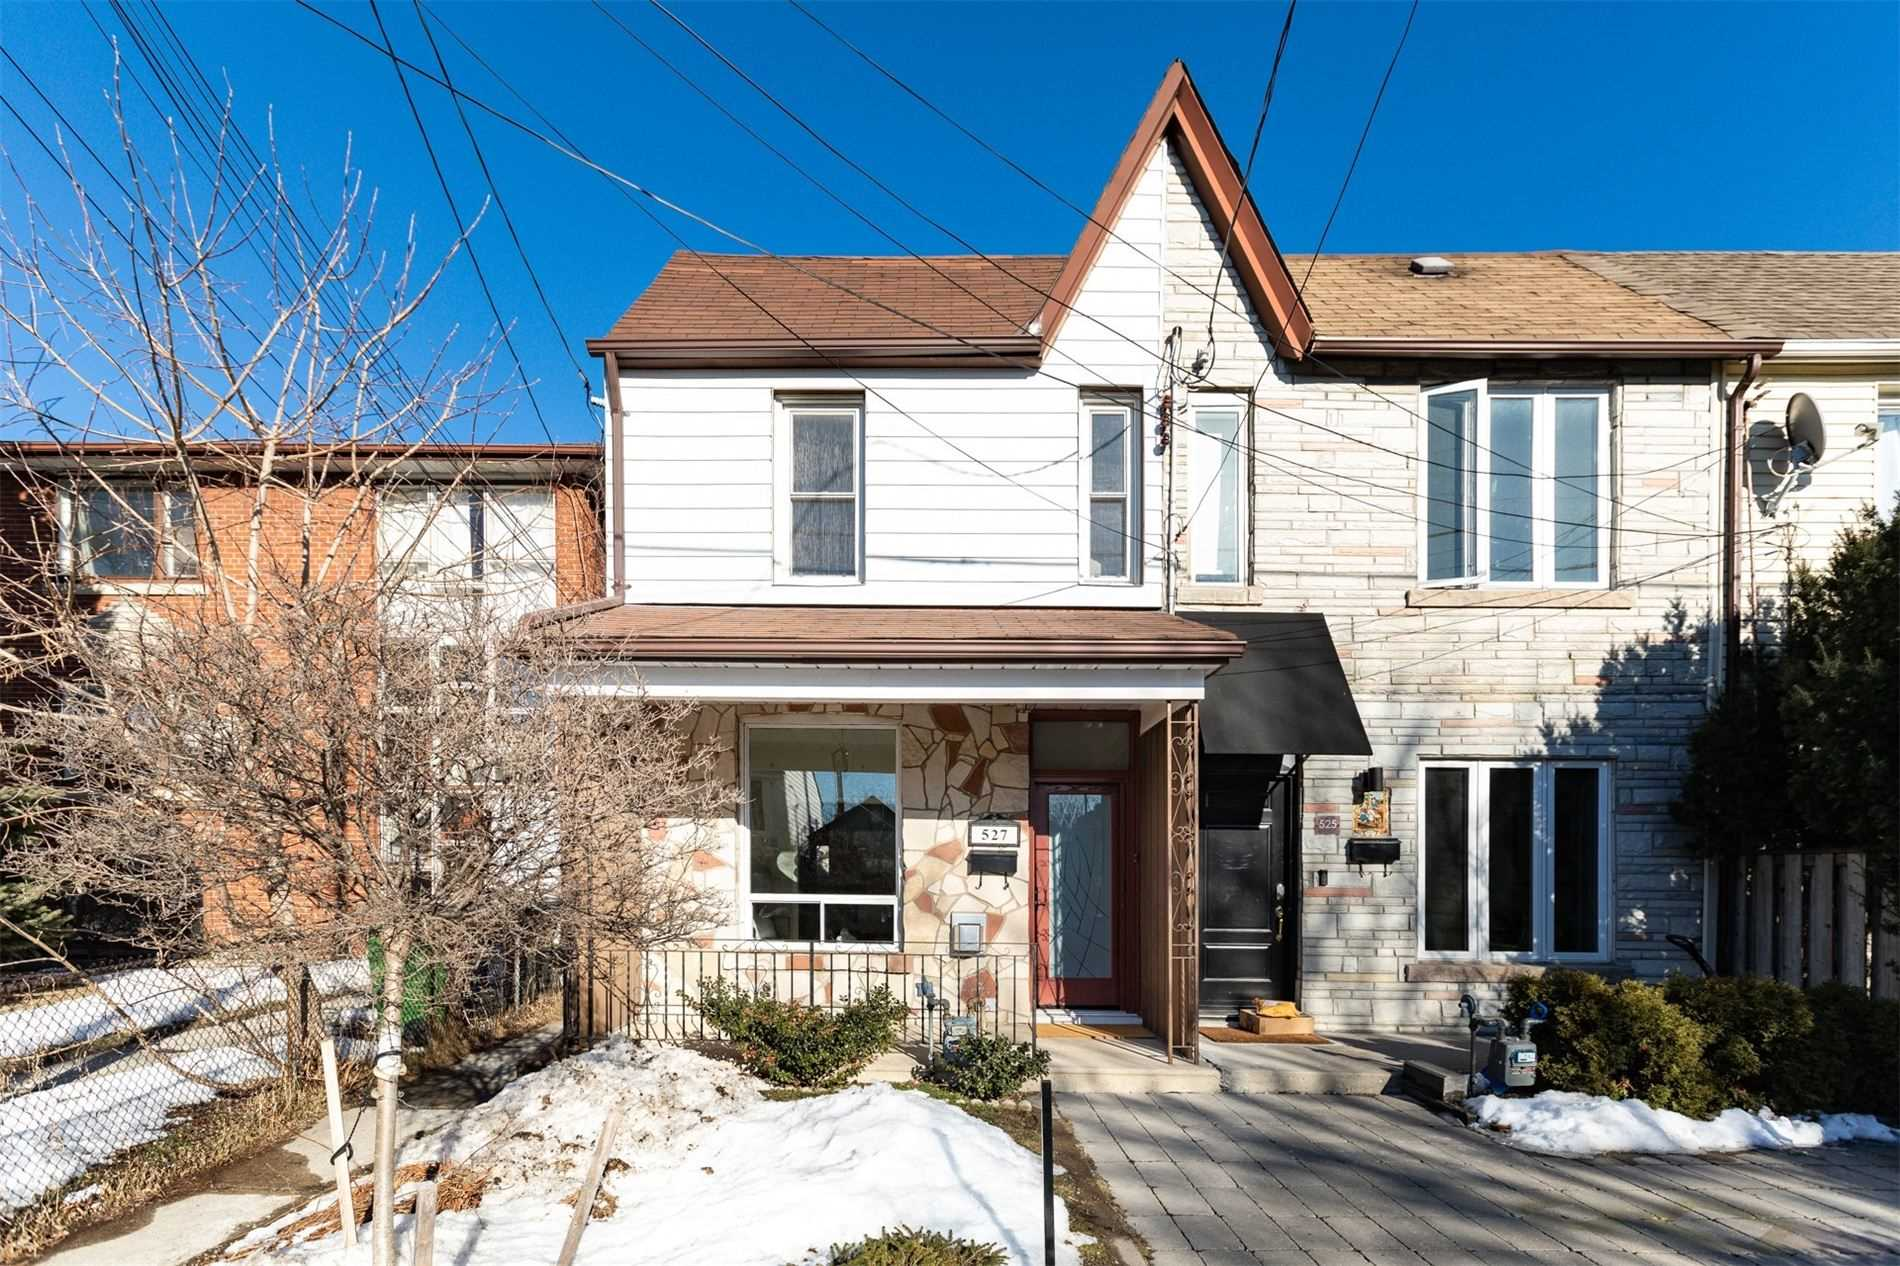 527 Quebec Ave, Toronto, Ontario M6P2V6, 3 Bedrooms Bedrooms, ,3 BathroomsBathrooms,Att/row/twnhouse,For Sale,Quebec,W5145891